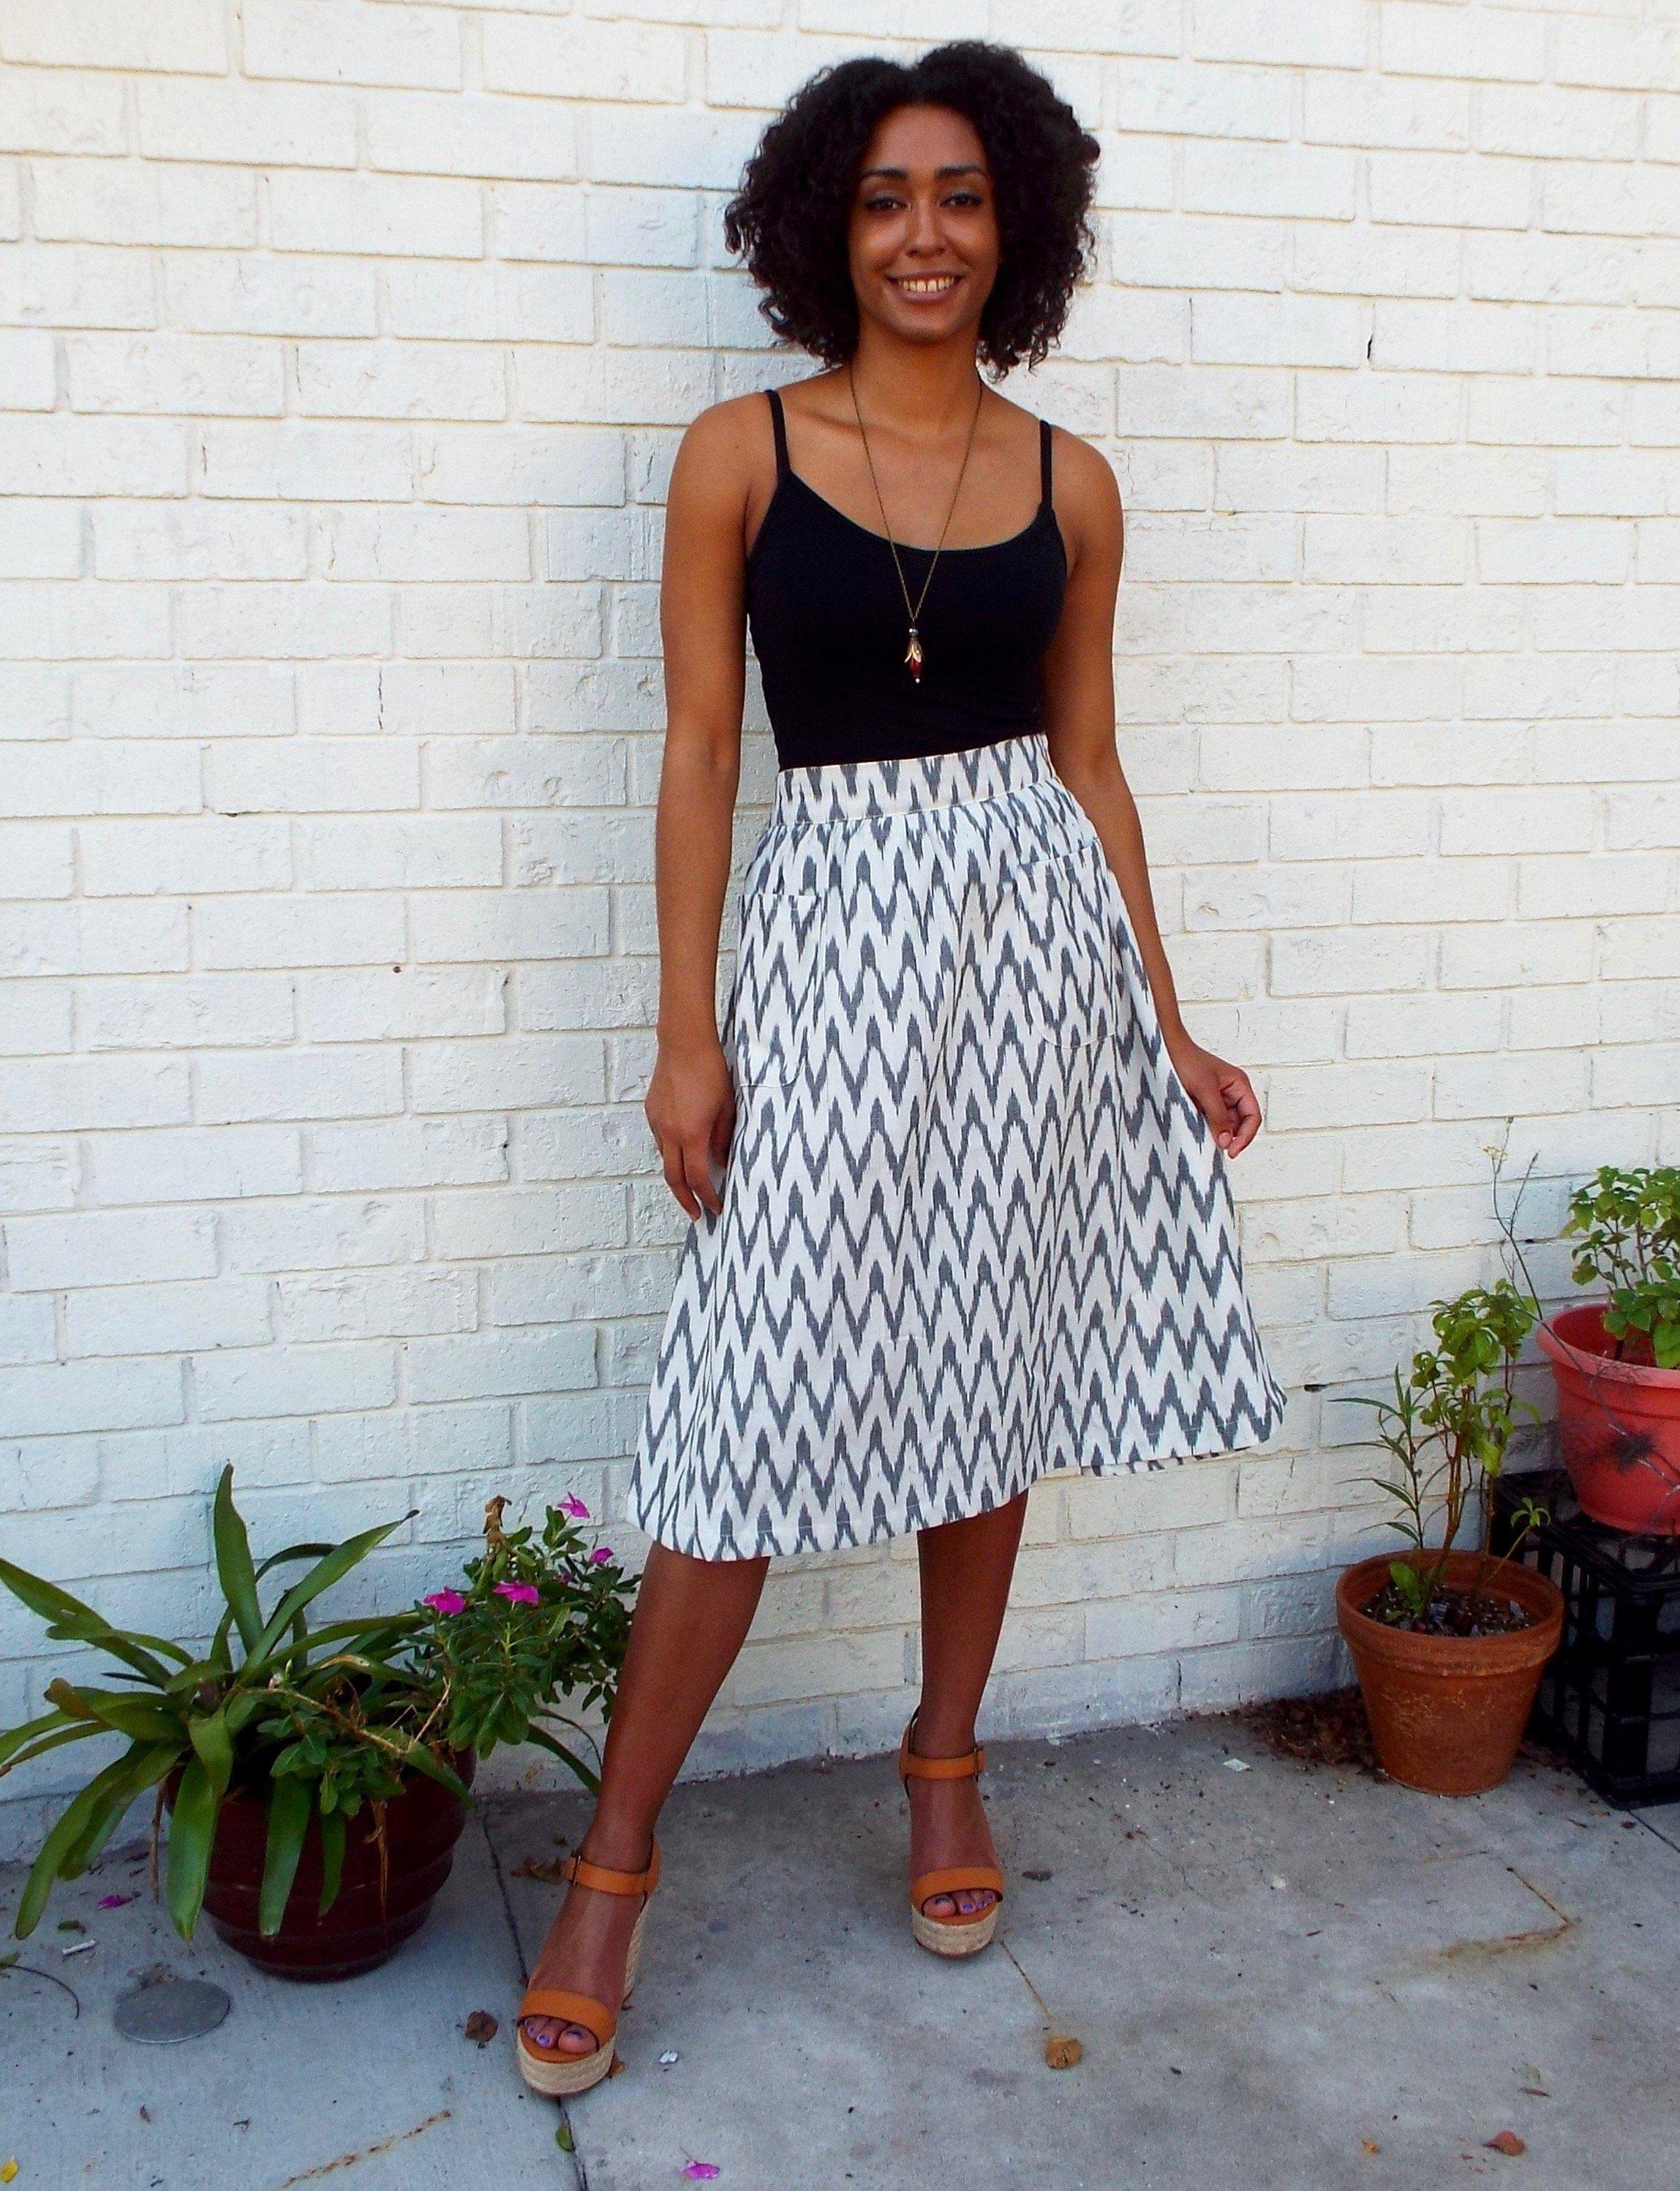 The Classic Midi Skirt